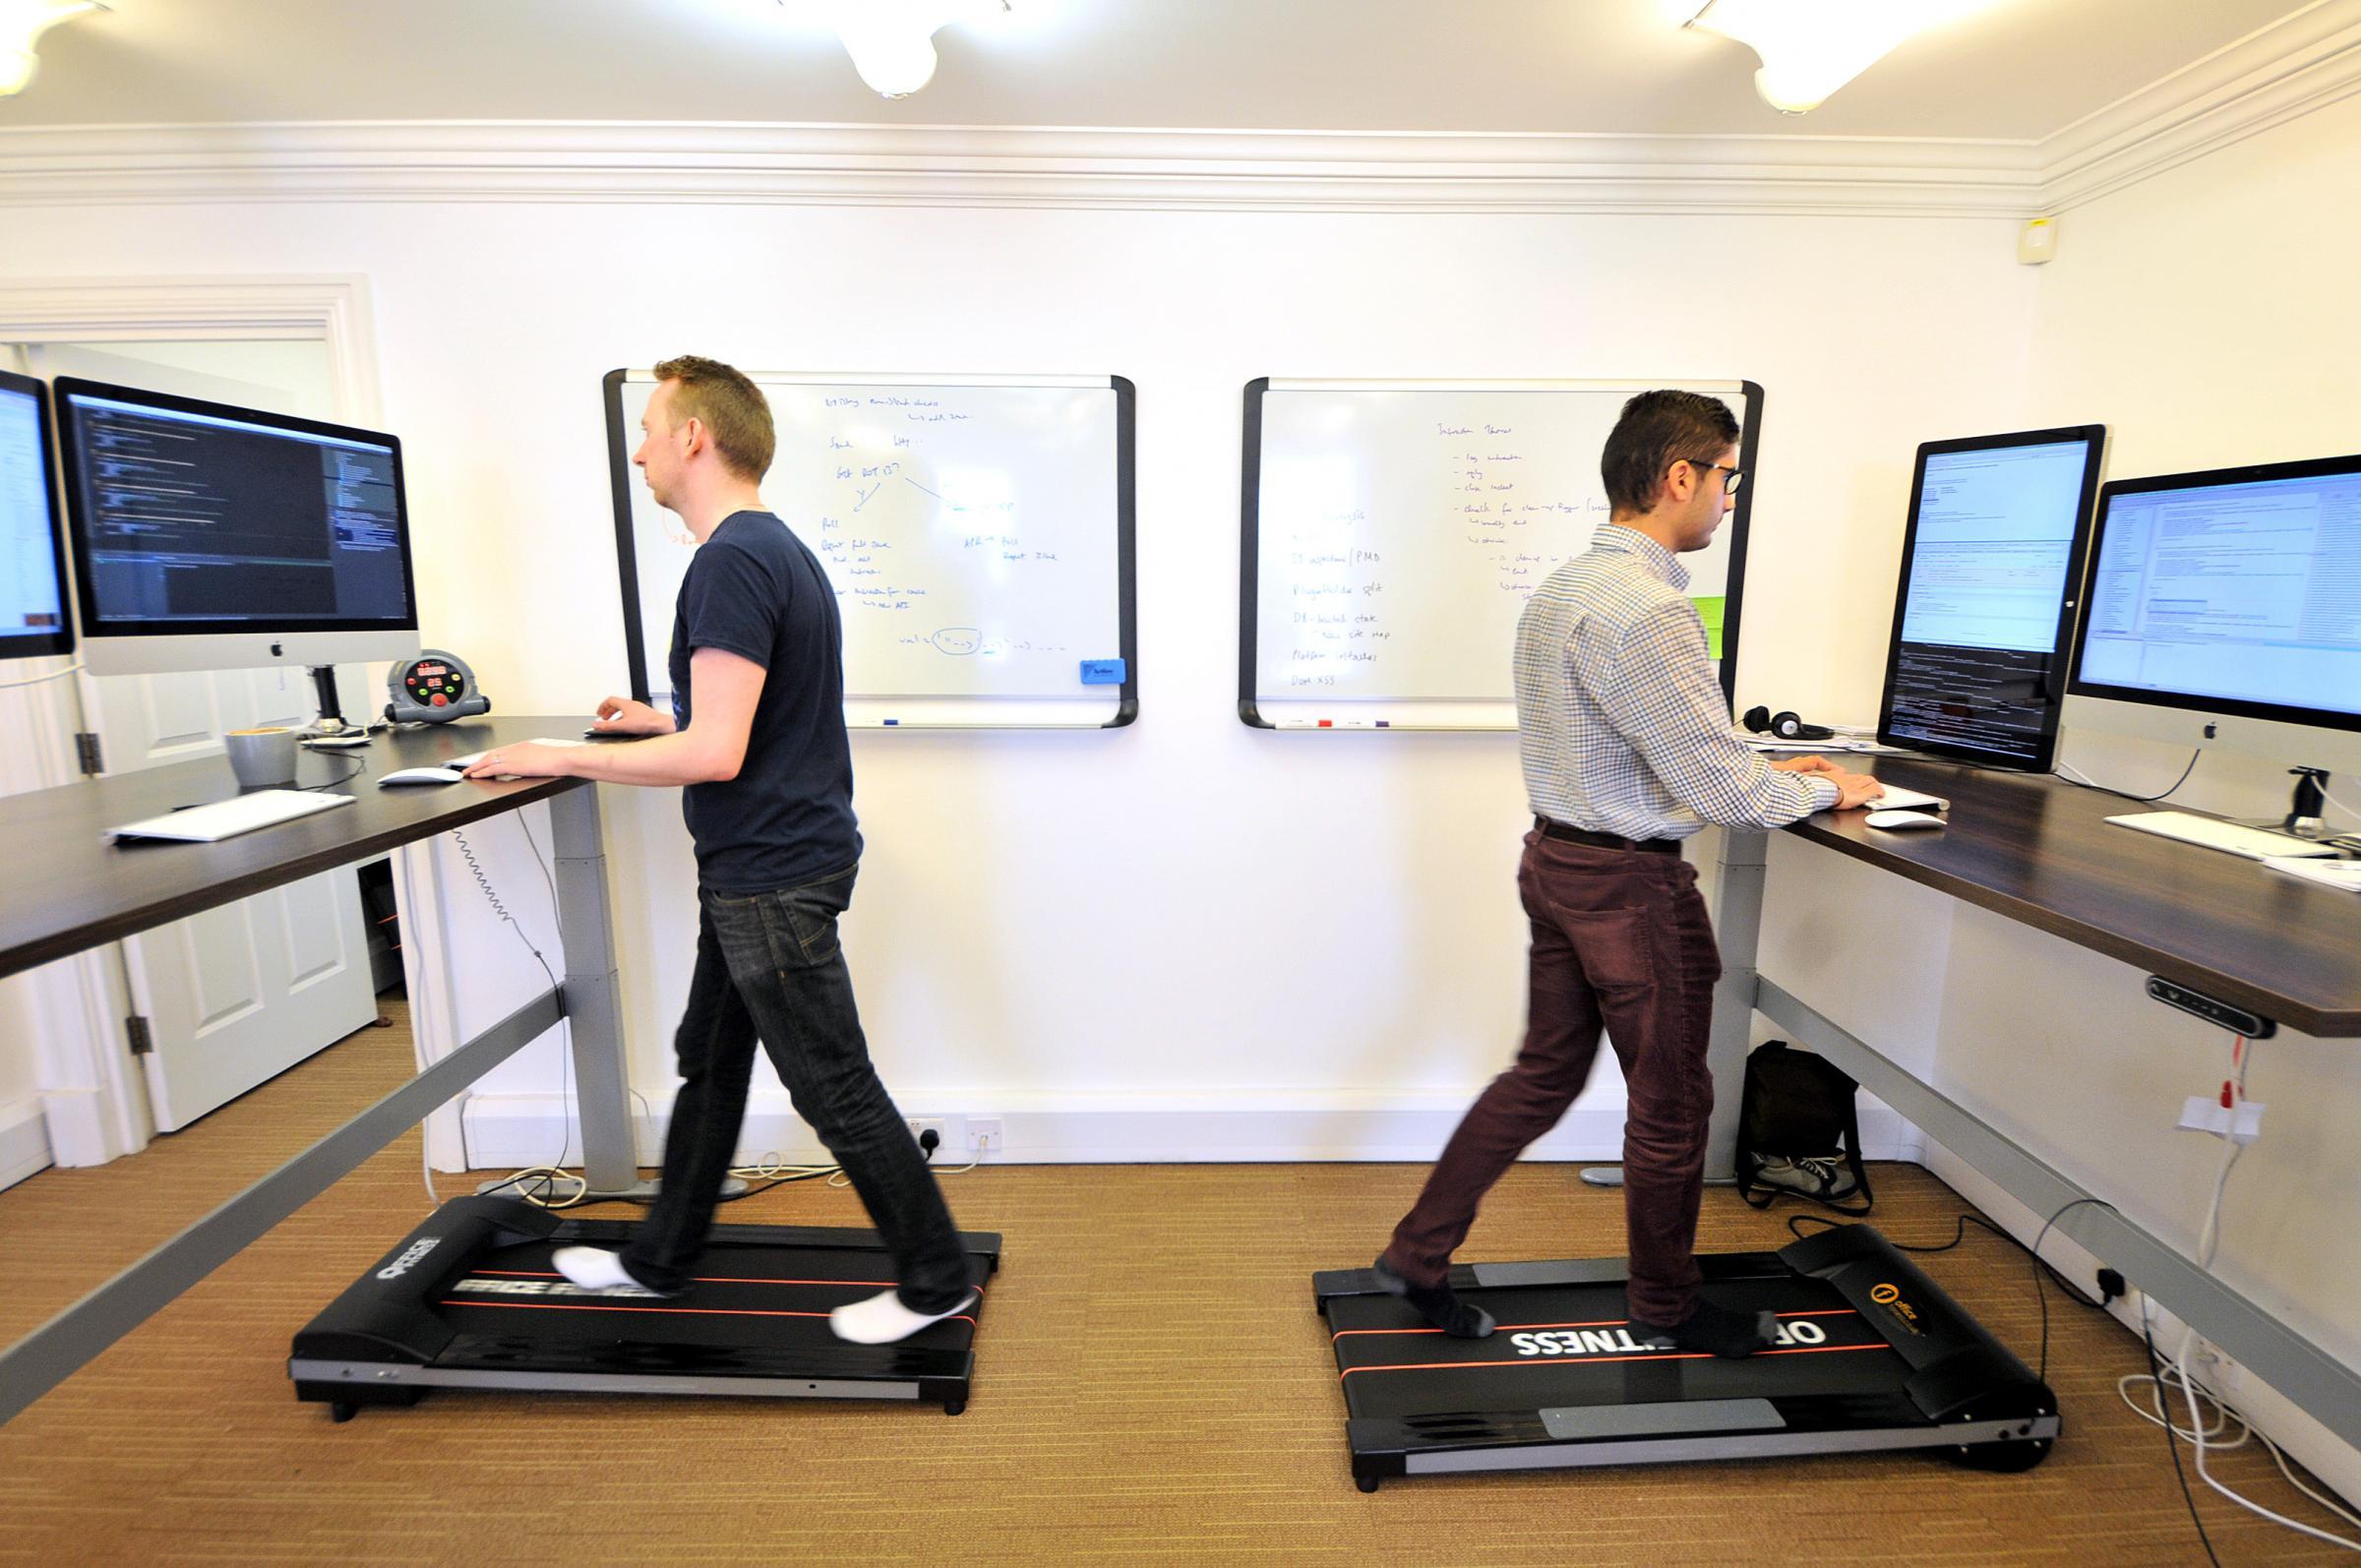 Beau Knutsford Entrepreneur Reveals Innovative Office Treadmills